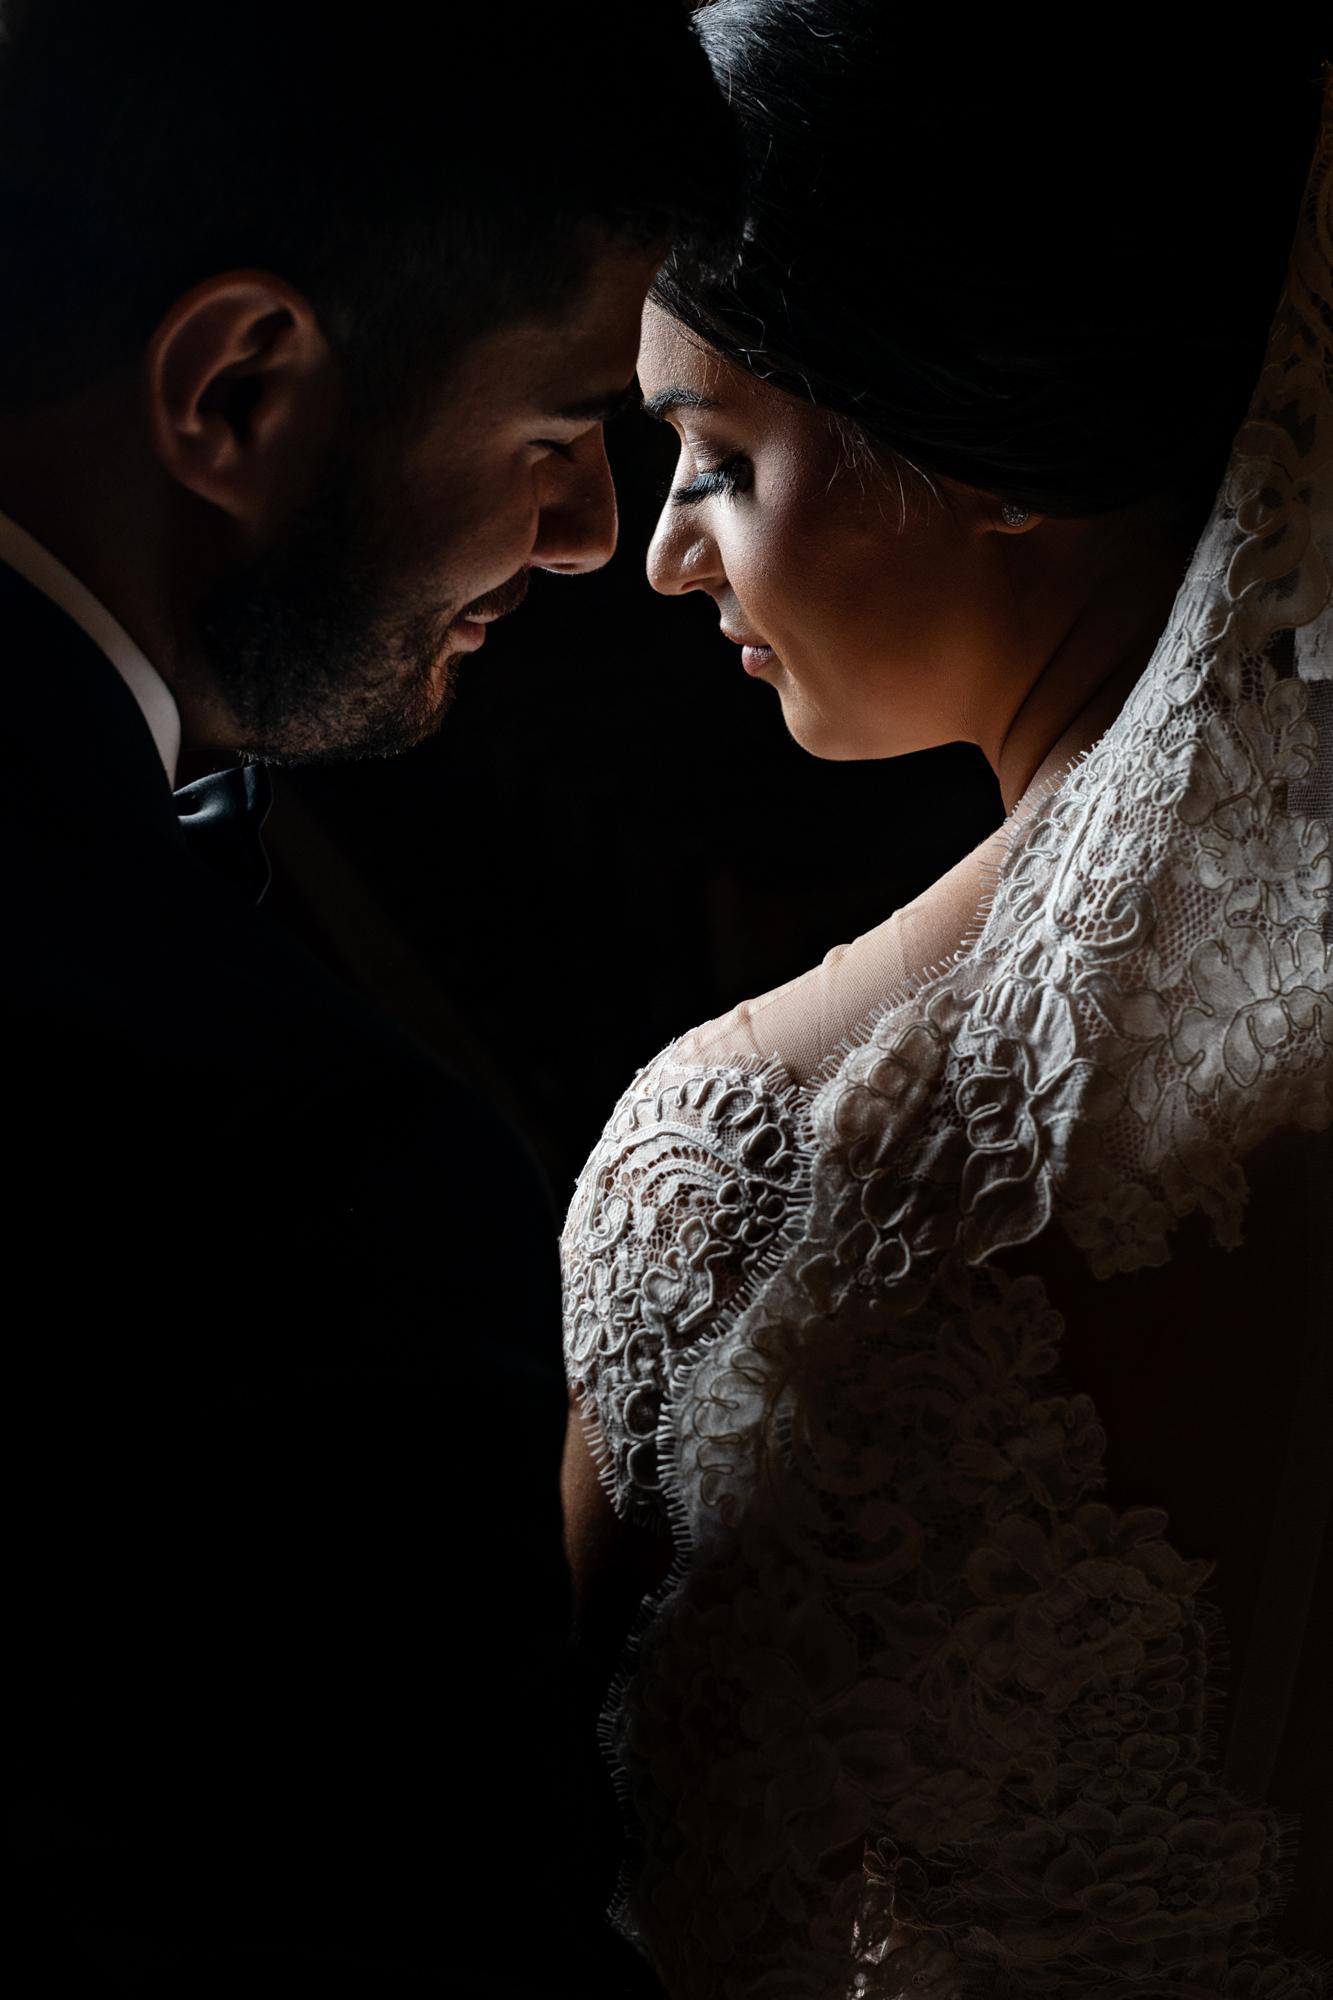 face-to-face-couple-portrait-worlds-best-wedding-photos-jeff-cooke-nova-scotia-wedding-photographers